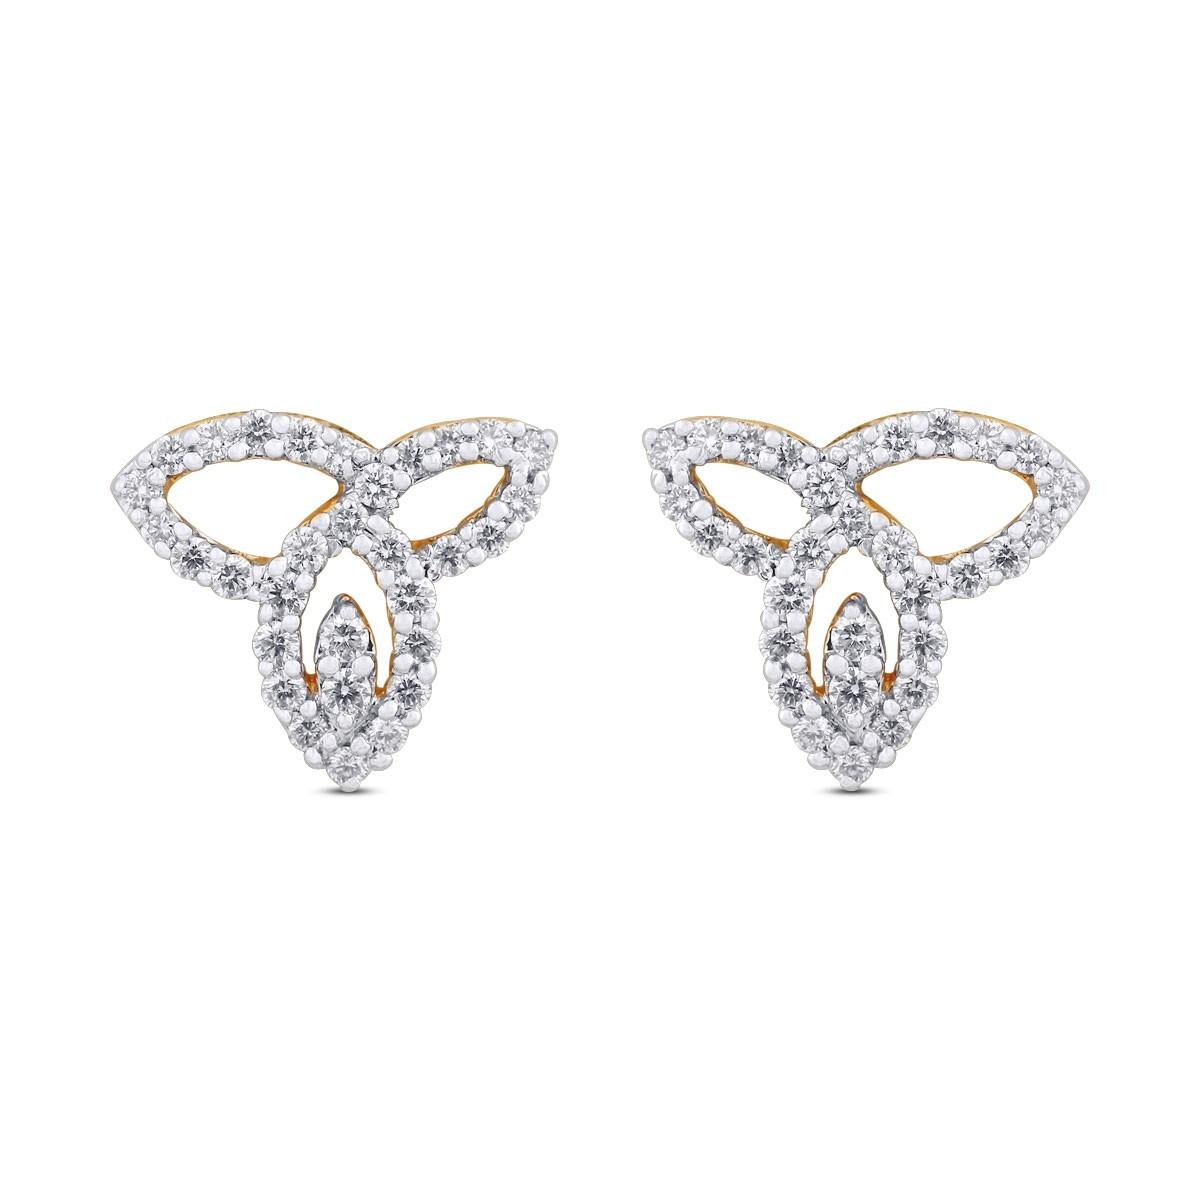 Eva Yellow Gold Diamond Stud Earrings